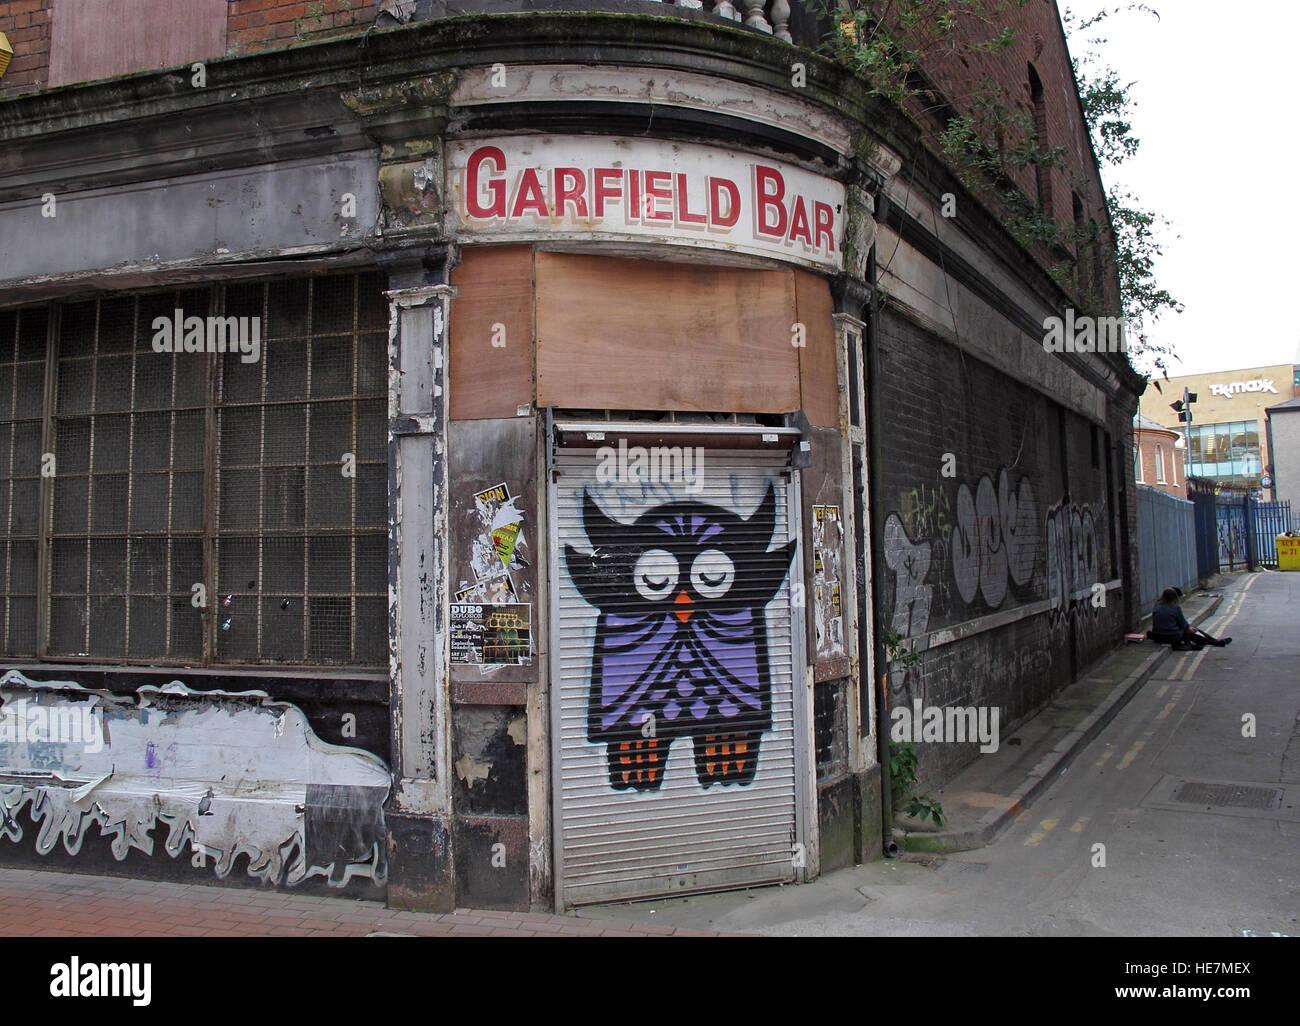 Belfast Garfield Street,Garfield Street,streets,City Centre,city,centre,Northern Ireland,UK,bar,bars,pub,pubs,eyesore,eye,sore,dilapidation,decrepitude,shabby,ruin,decayed,run,down,rundown,decay,collapse,GoTonySmith,@HotpixUK,Tony,Smith,UK,GB,Great,Britain,United,Kingdom,Irish,British,Ireland,problem,with,problem with,issue with,NI,Northern,Northern Ireland,Belfast,City,Centre,Art,Artists,graffiti,grafitti,honour,painting,wall,walls,tribute,grafiti,paint,painting,tag,tagging,tagged,Fight,Justice,West,Beal,feirste,martyrs,social,tour,tourism,tourists,urban,six,counties,6,backdrop,county,Antrim,Belfast Garfield St,Buy Pictures of,Buy Images Of,Images of,Stock Images,Tony Smith,United Kingdom,Great Britain,British Isles